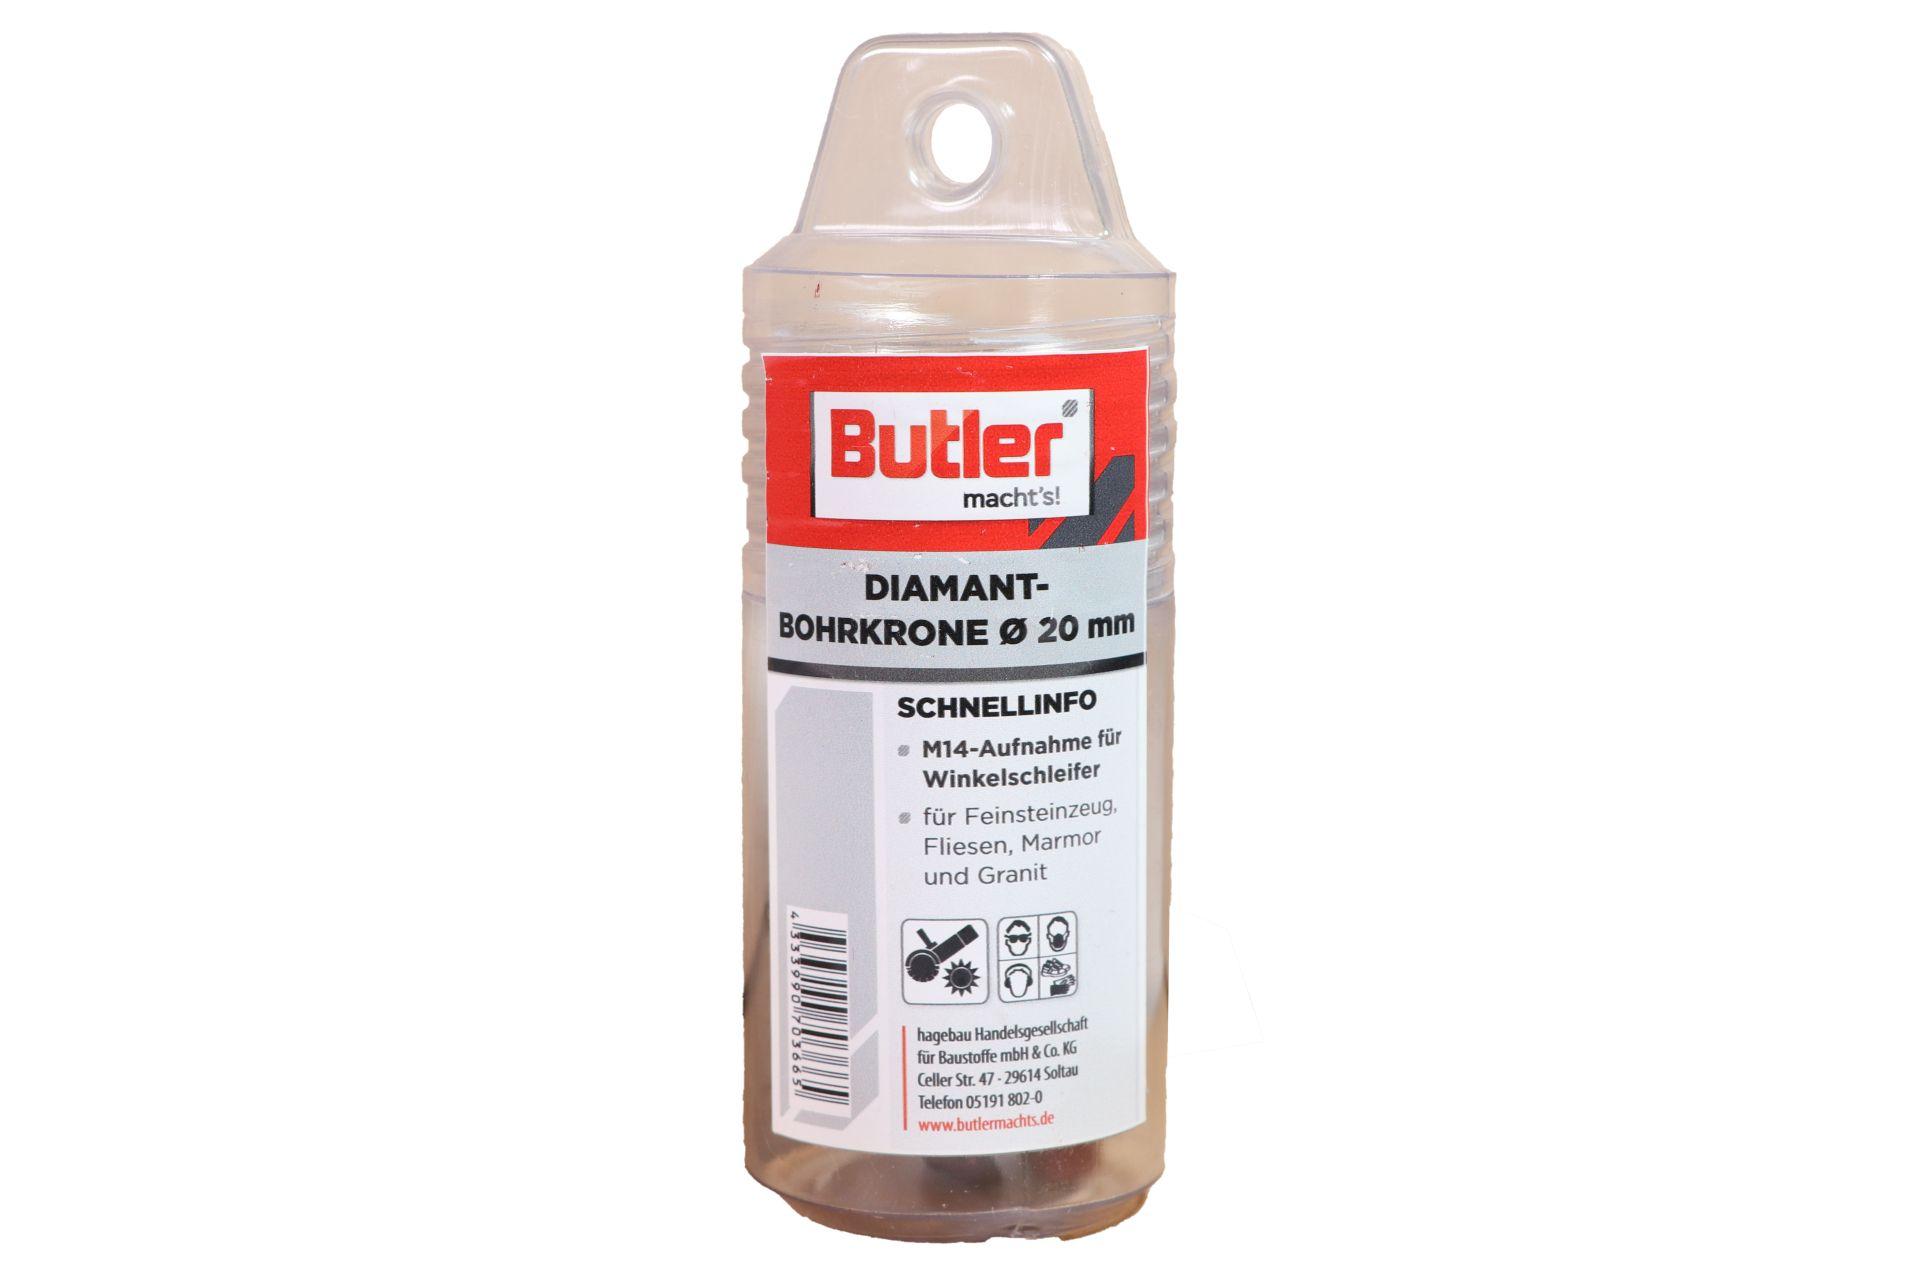 Butler macht's! Diamant-Bohrkrone, Ø 20 mm, Aufnahme M14, Bohrtiefe 45 mm